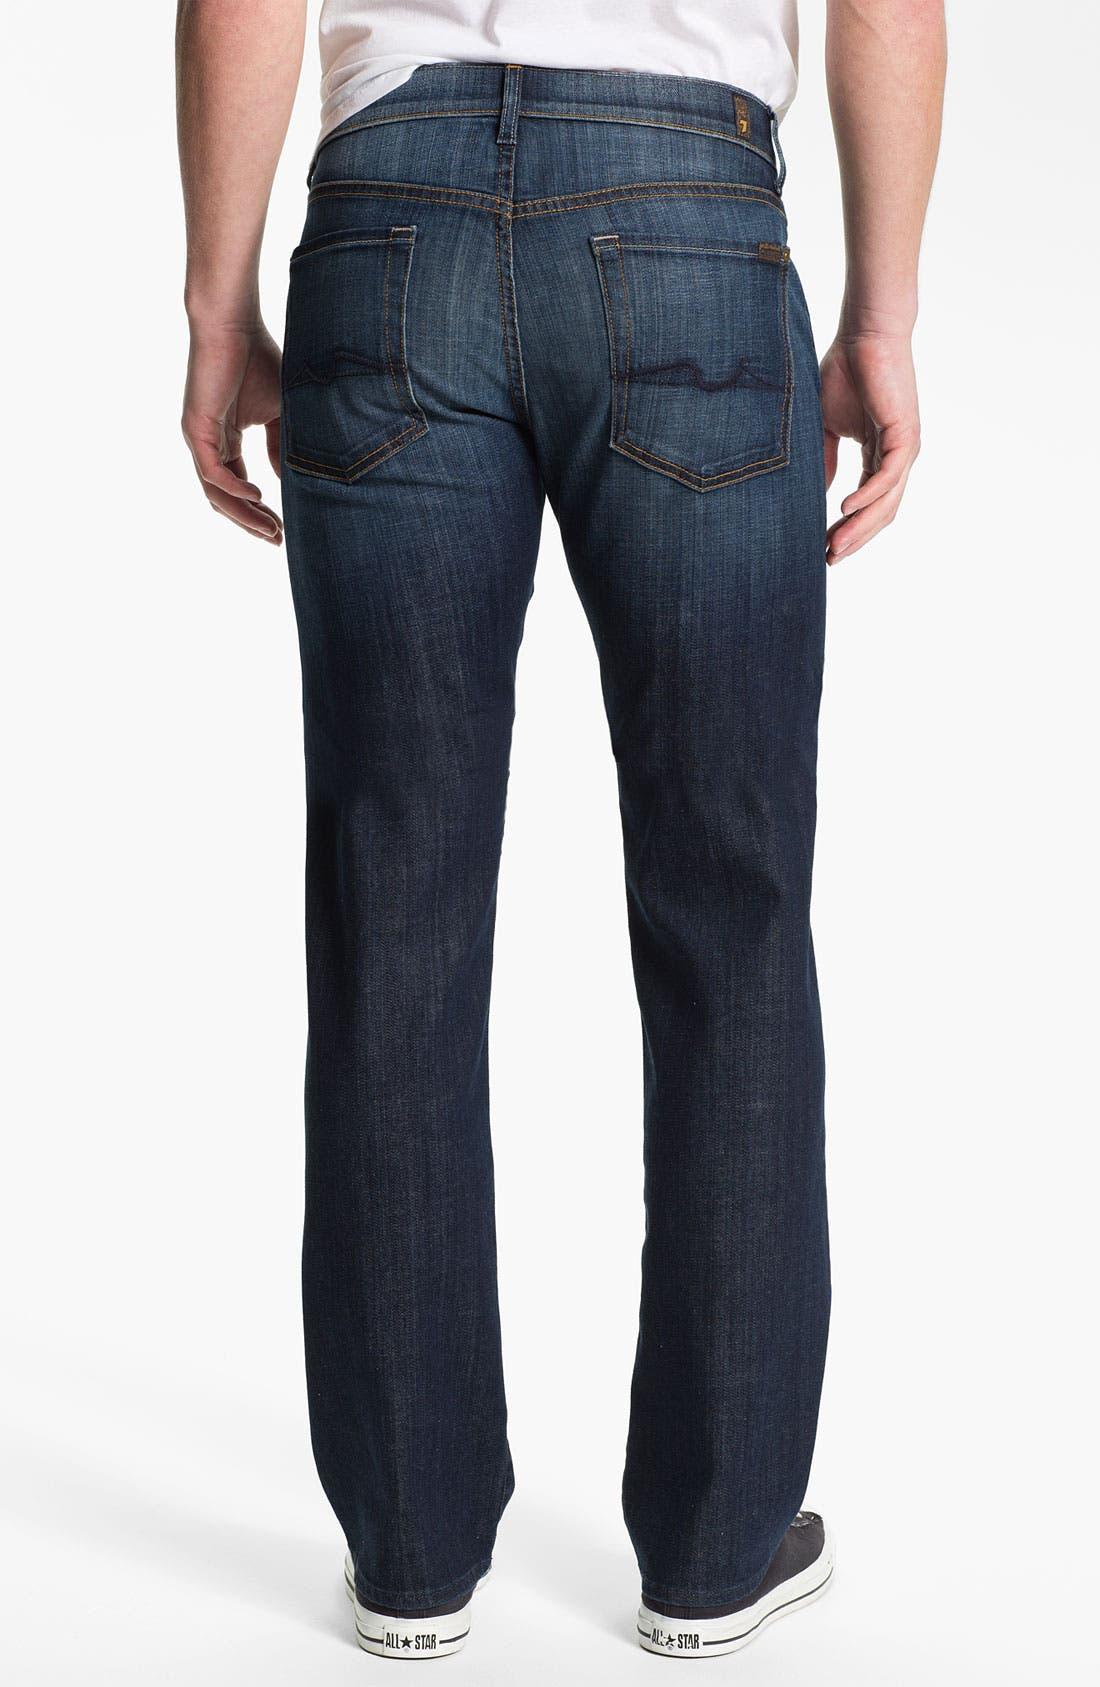 Main Image - 7 For All Mankind® 'Standard' Straight Leg Jeans (Worn L.A. Dark)